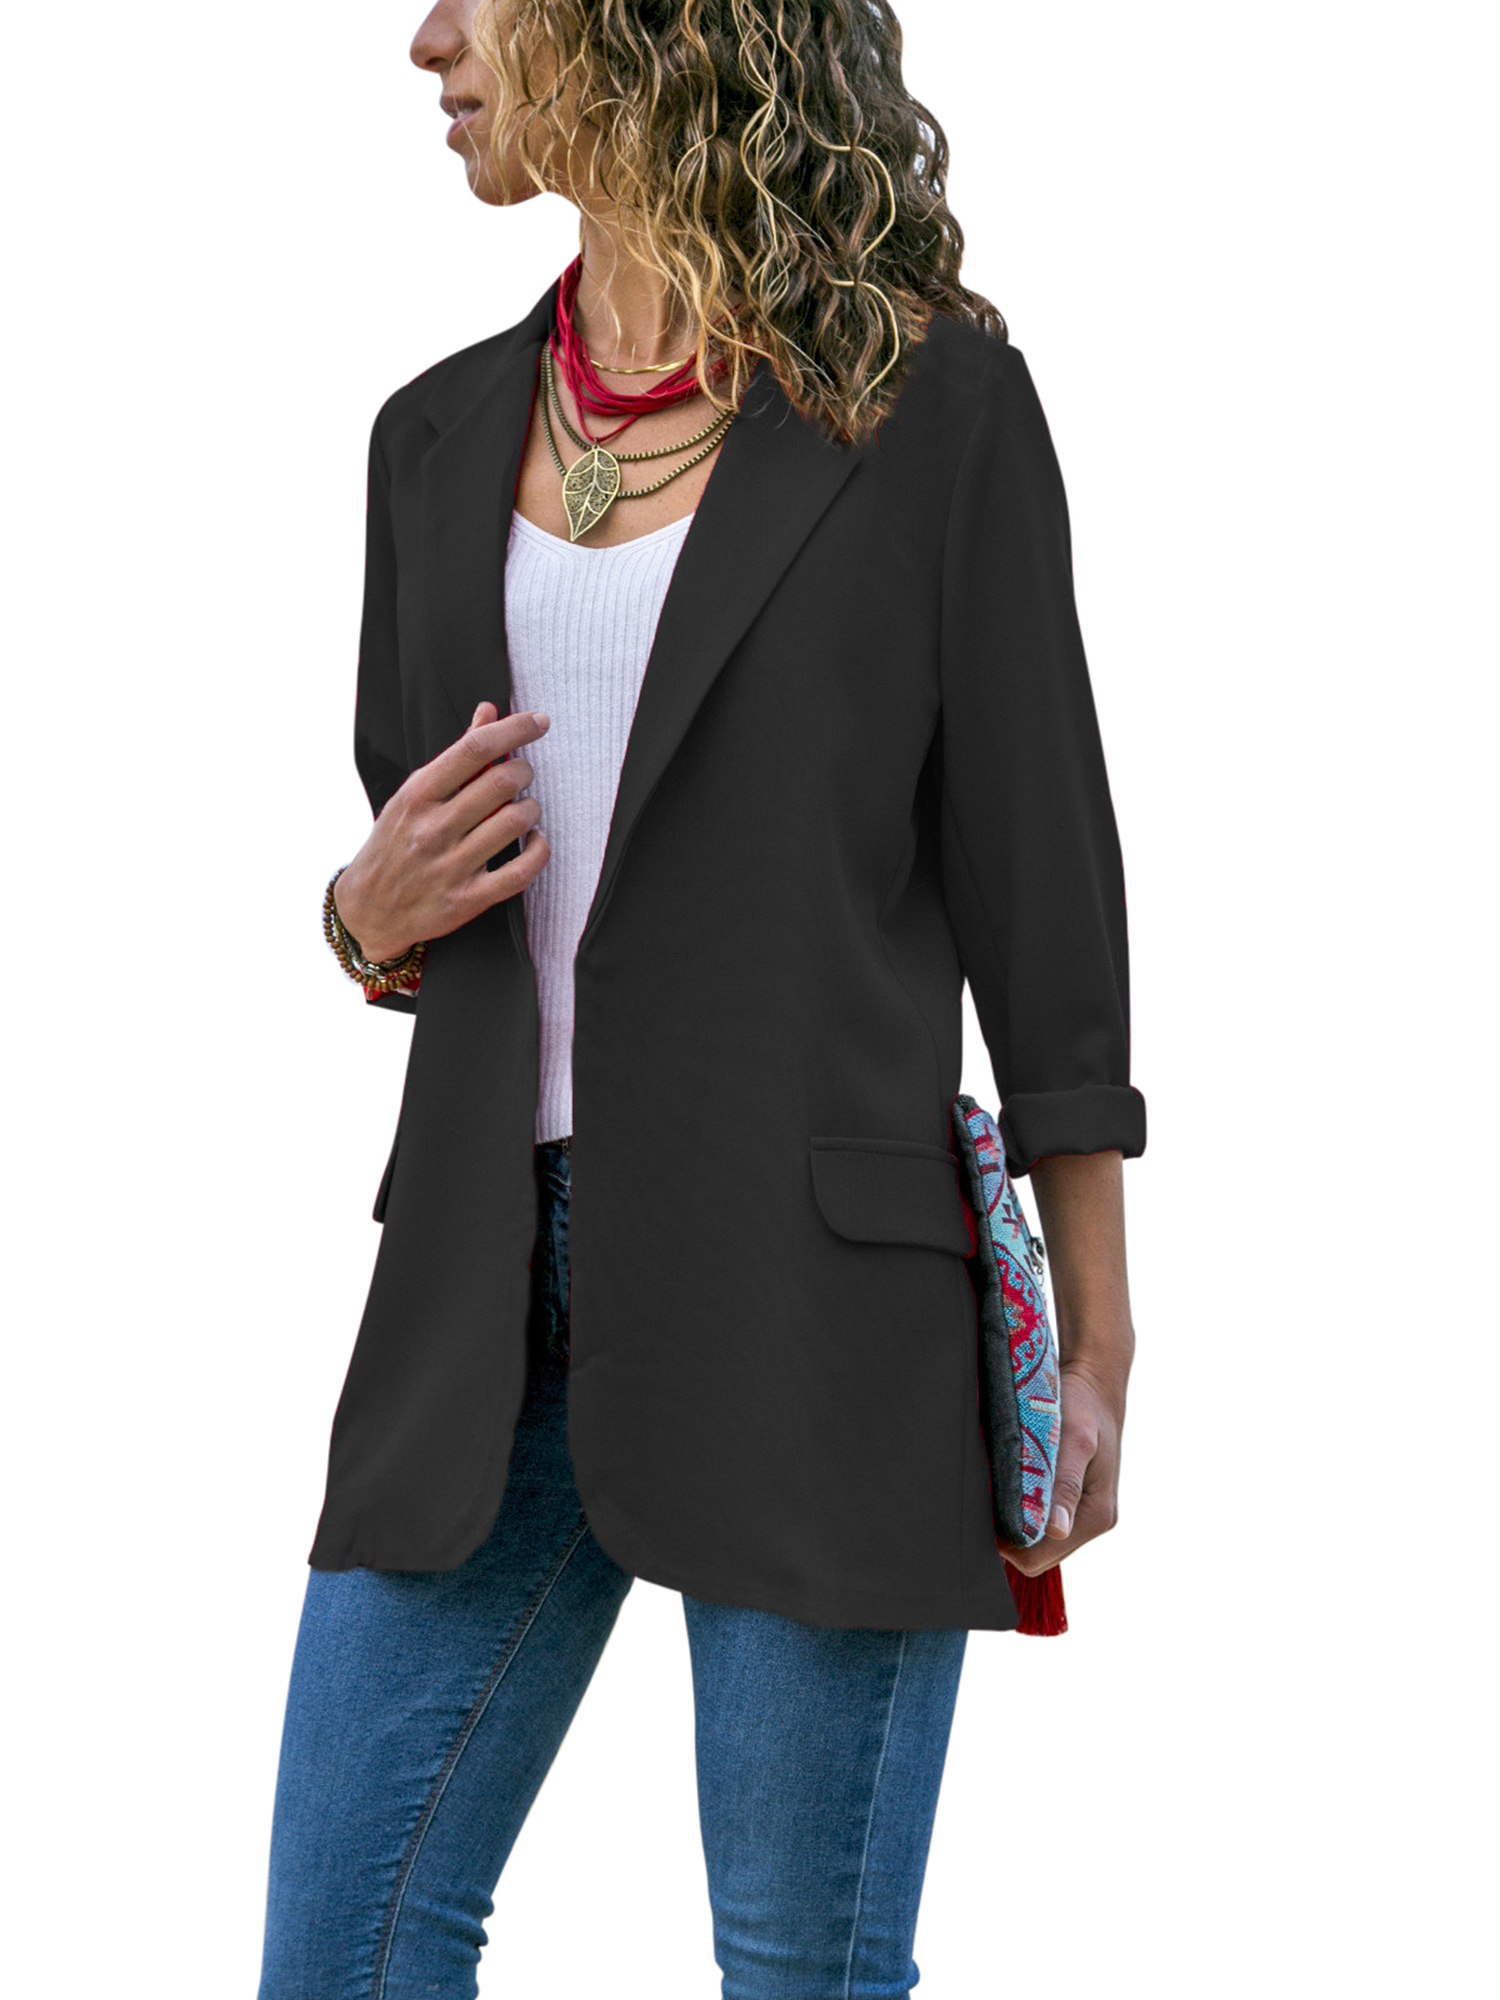 Fashionhe Womens Solid Lapel Outwear Sweater Casual Belt Cardigan Long Sleeve Business Coat